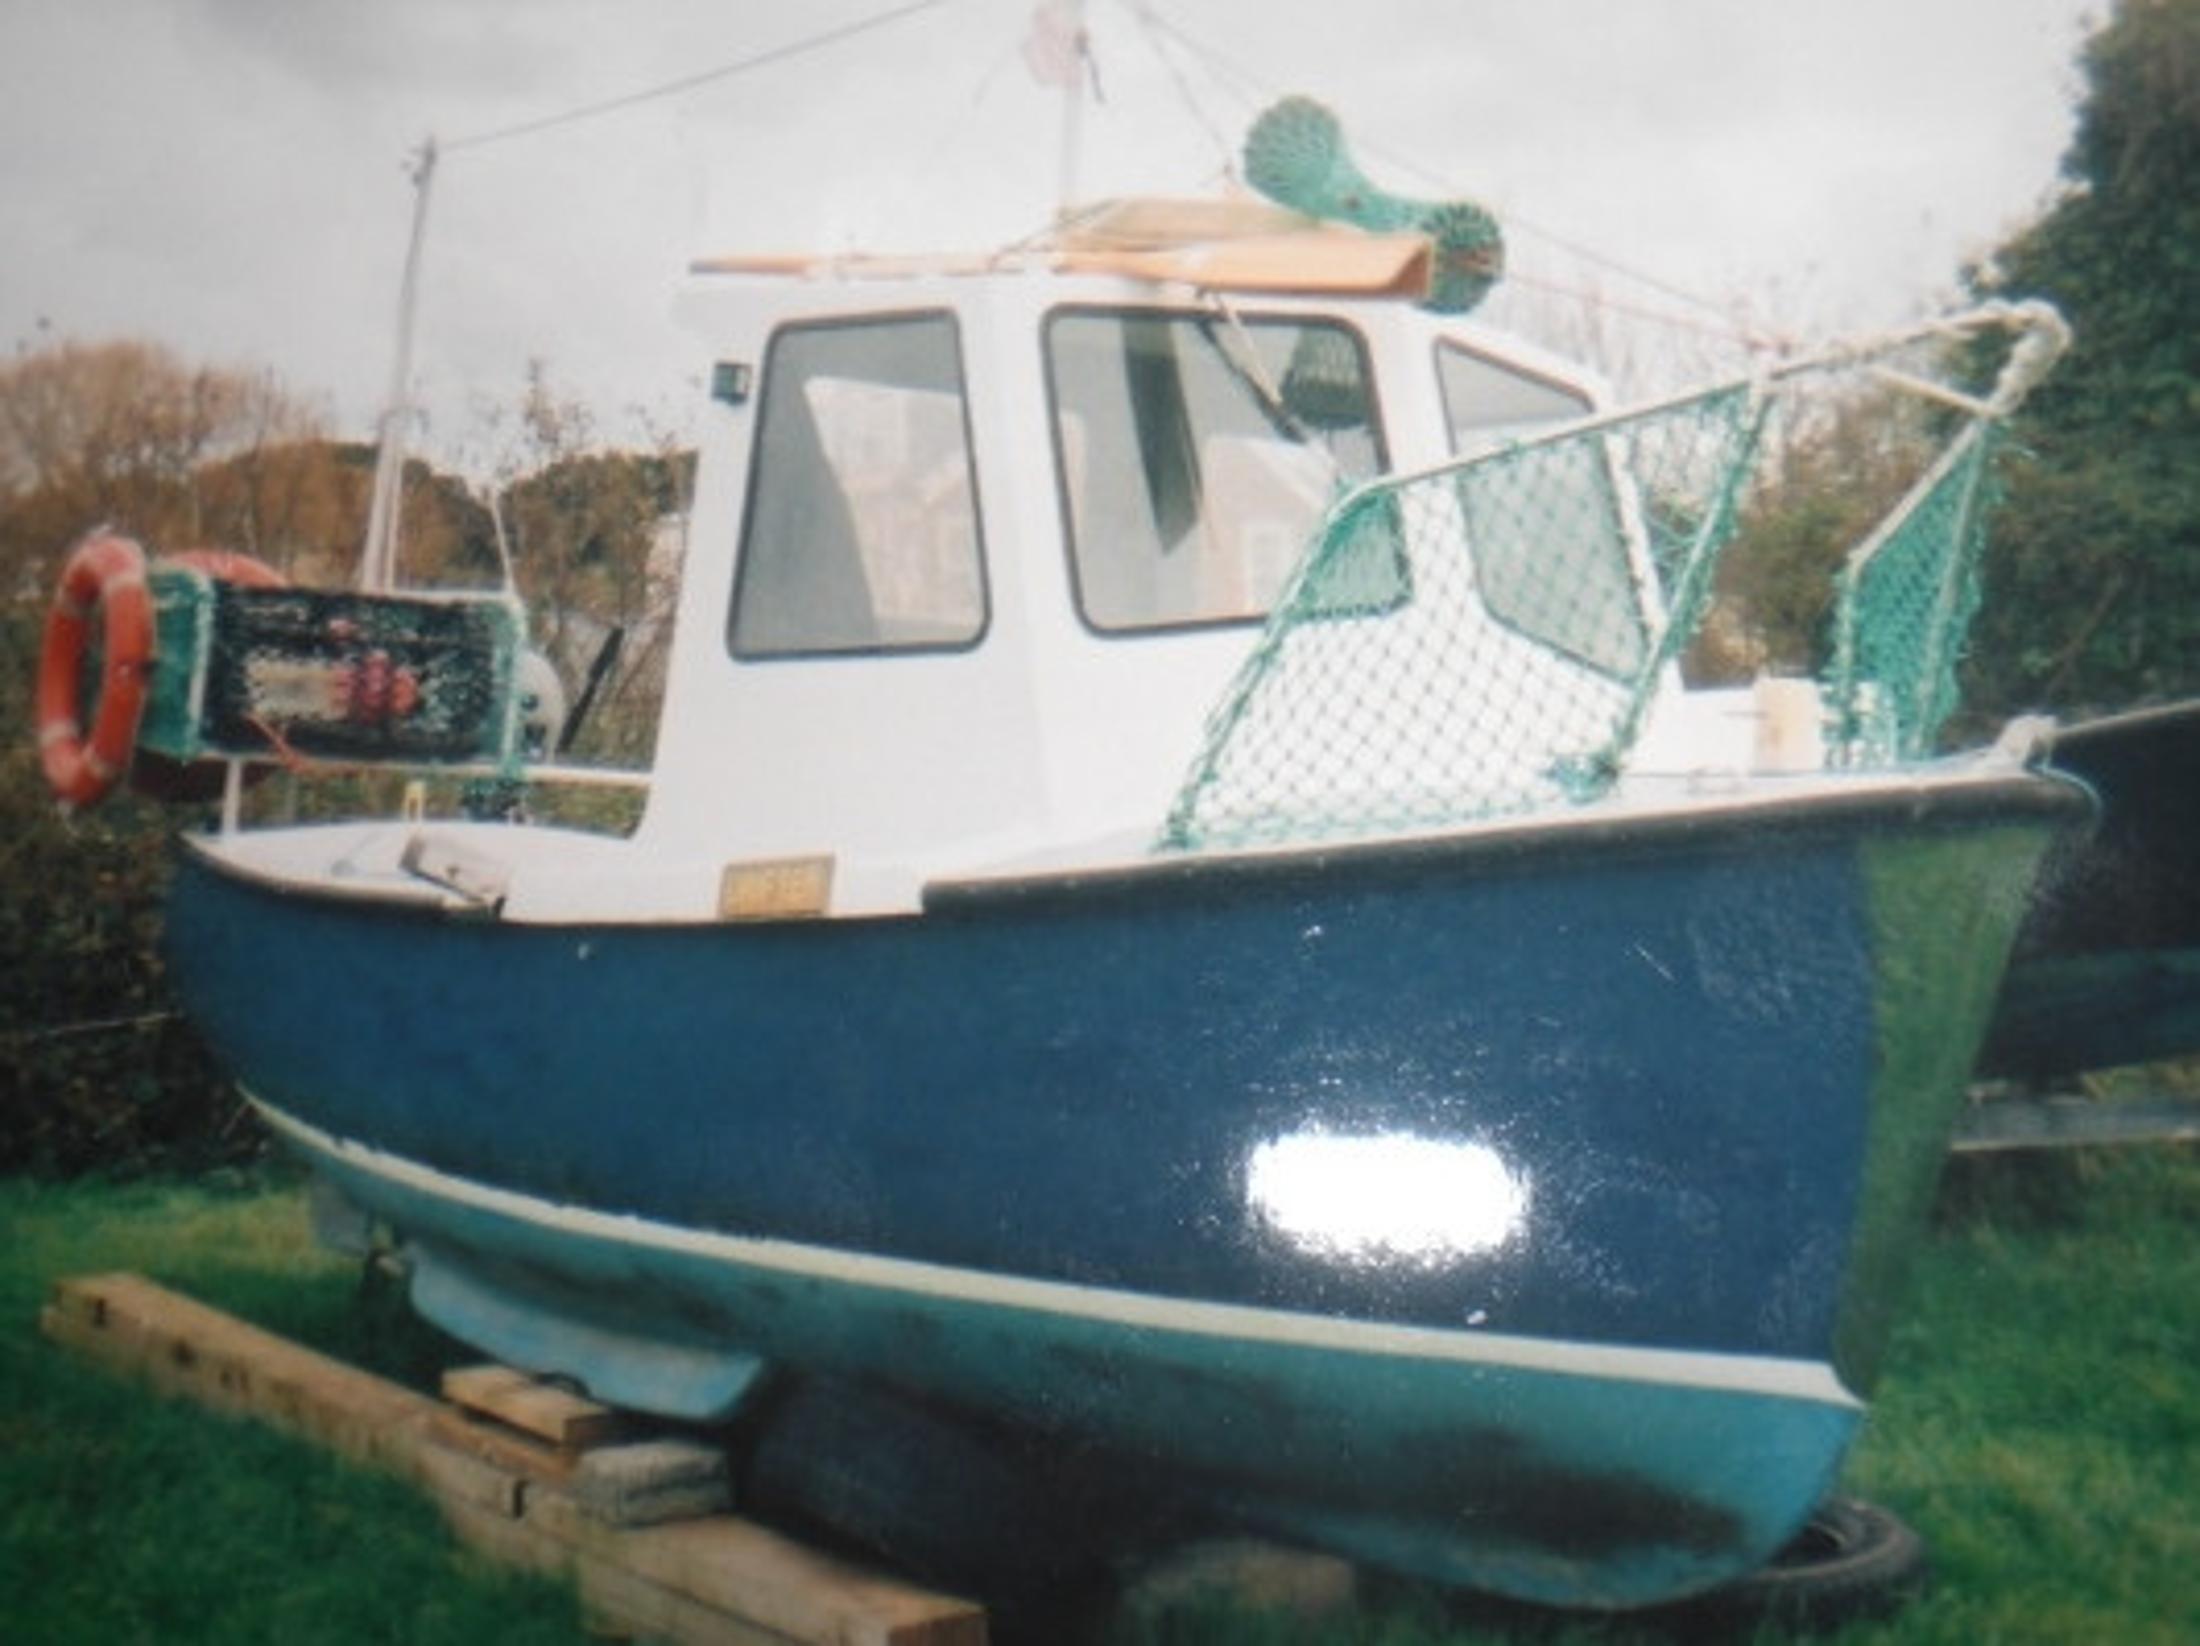 Plymouth Pilot 18 Brick7 Boats